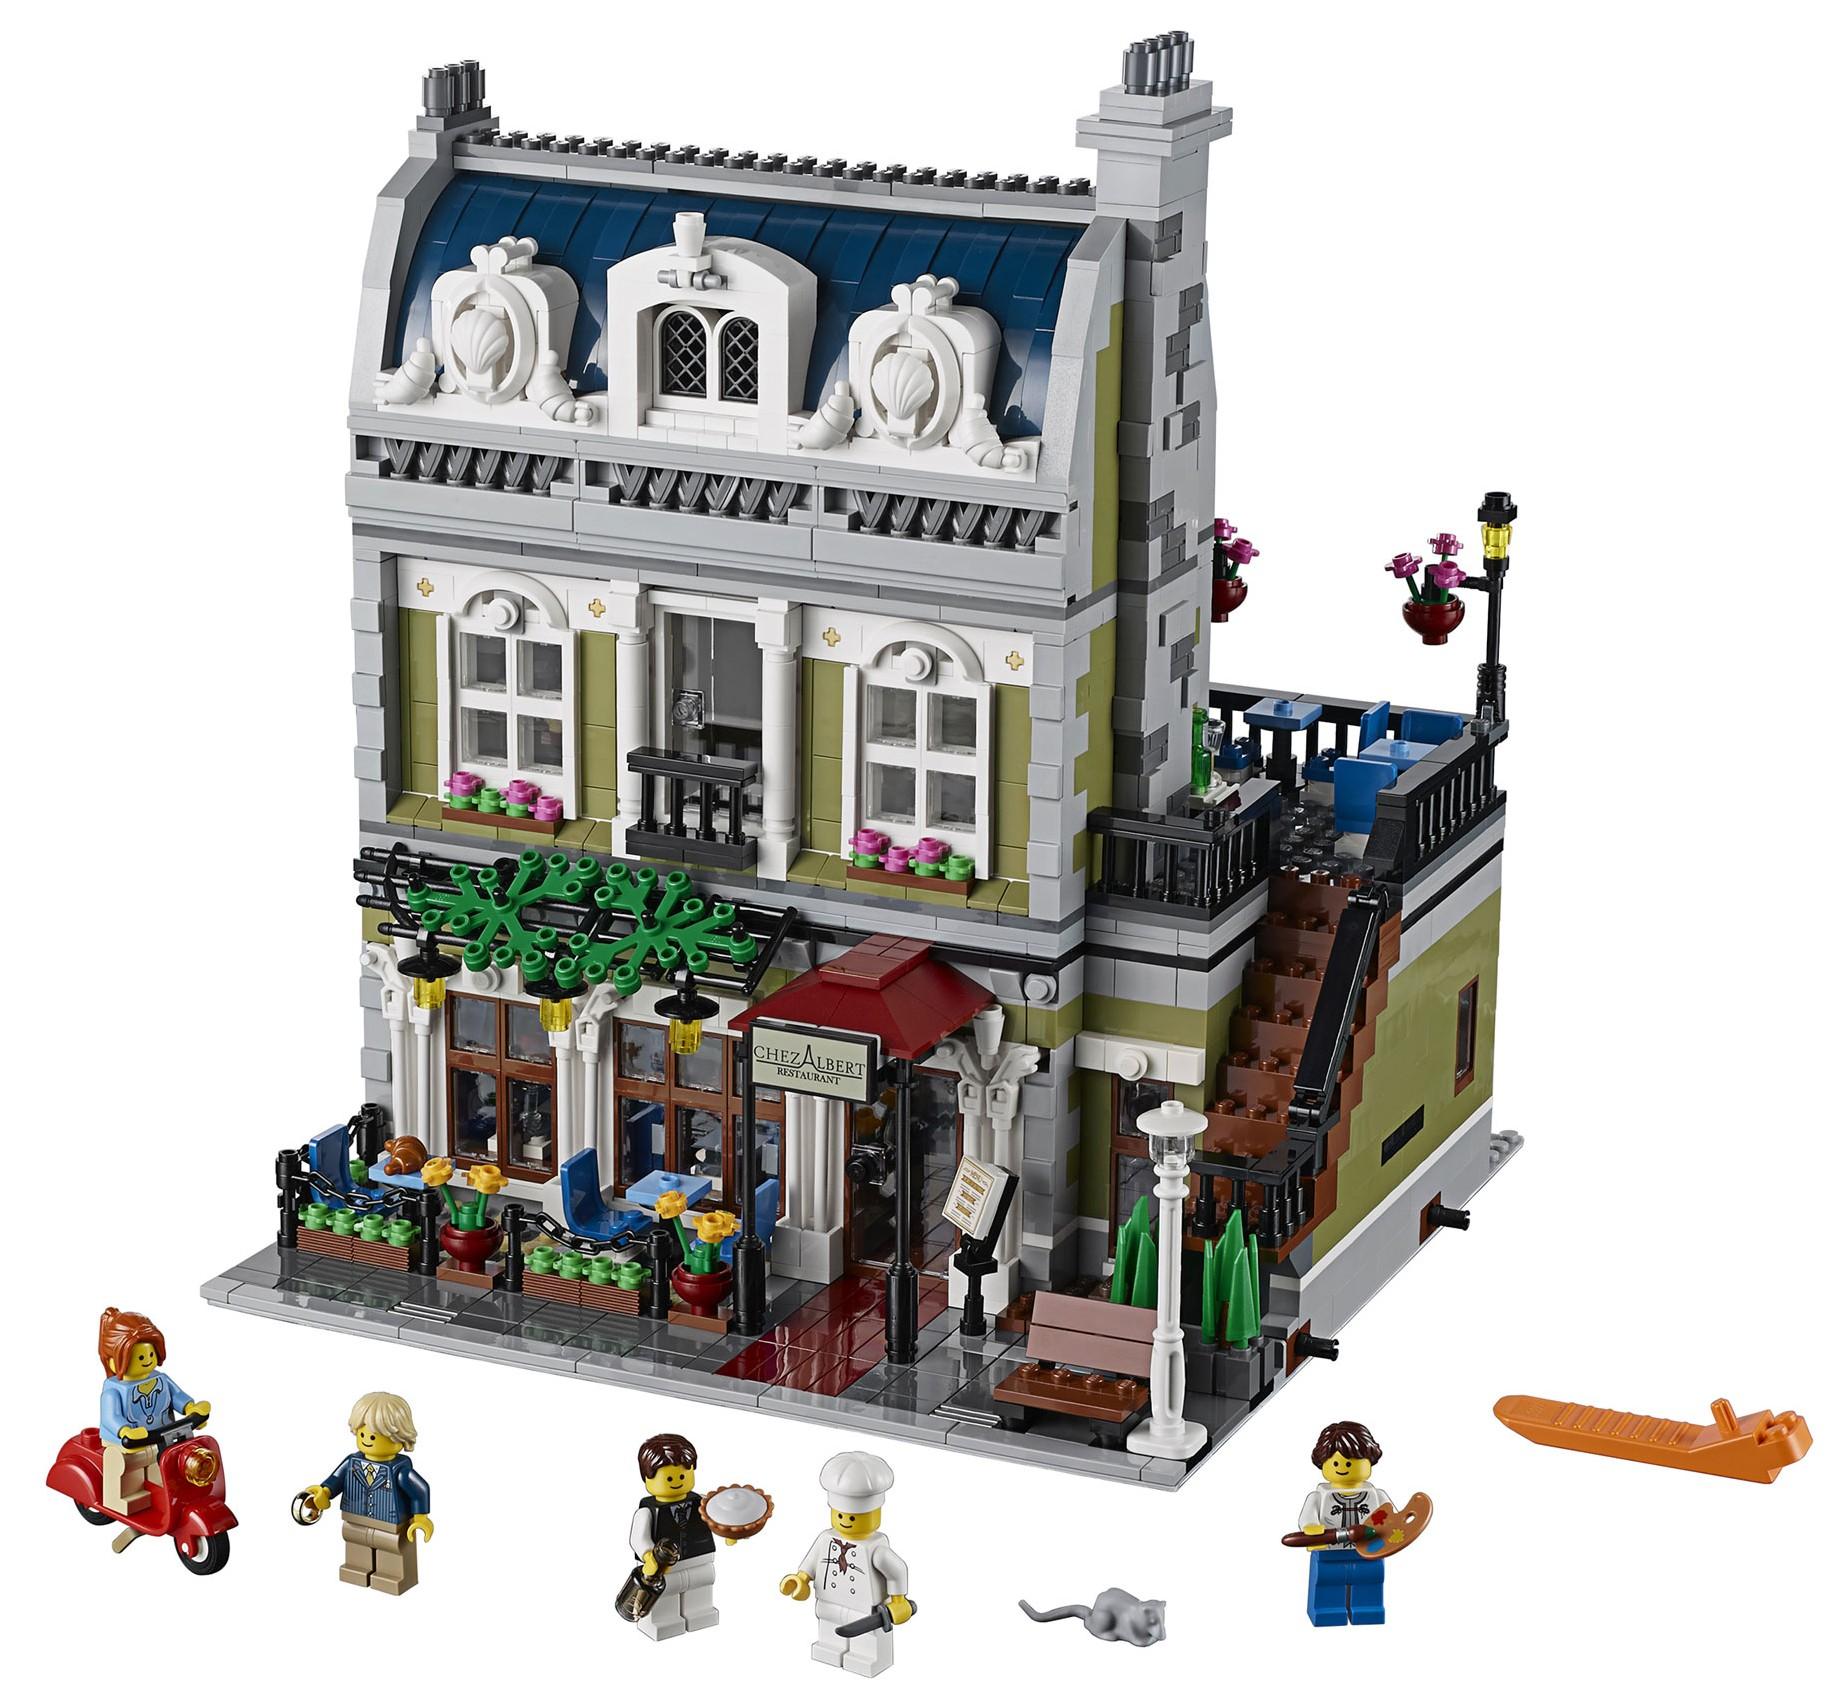 2014 lego parisian restaurant 10243 modular building photo preview bricks and bloks. Black Bedroom Furniture Sets. Home Design Ideas